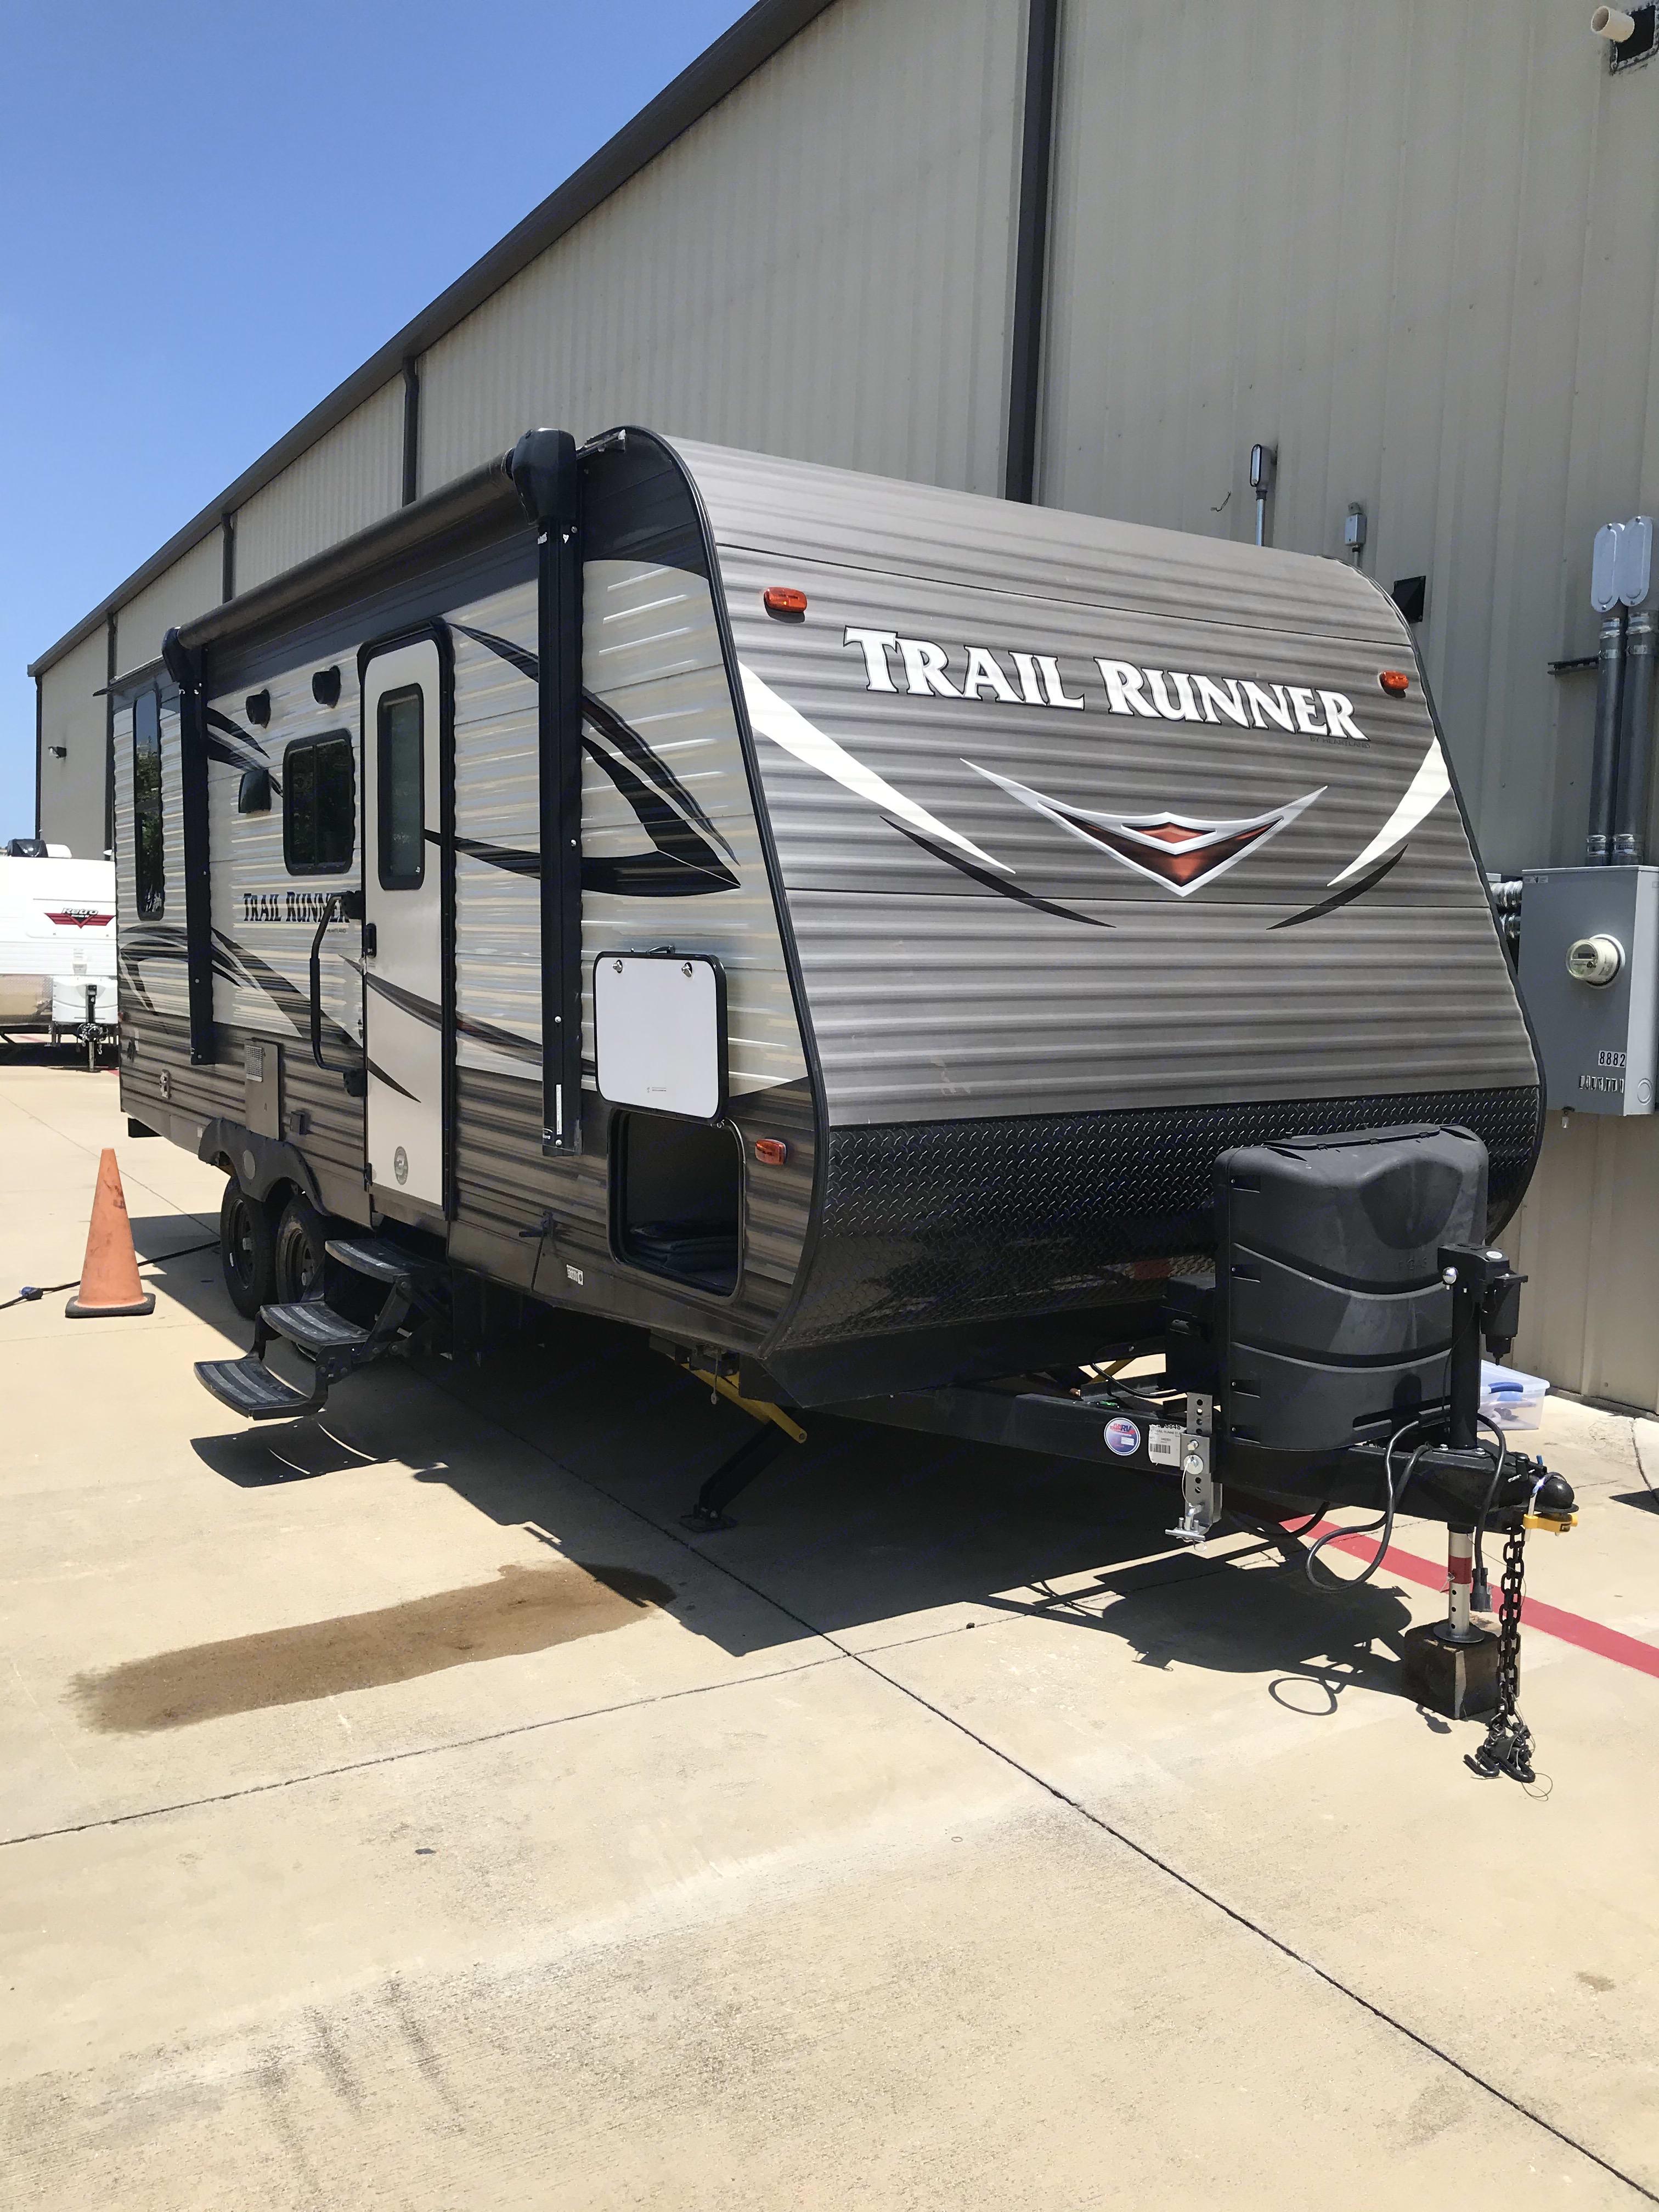 Actual trailer. Heartland Trail Runner 2019